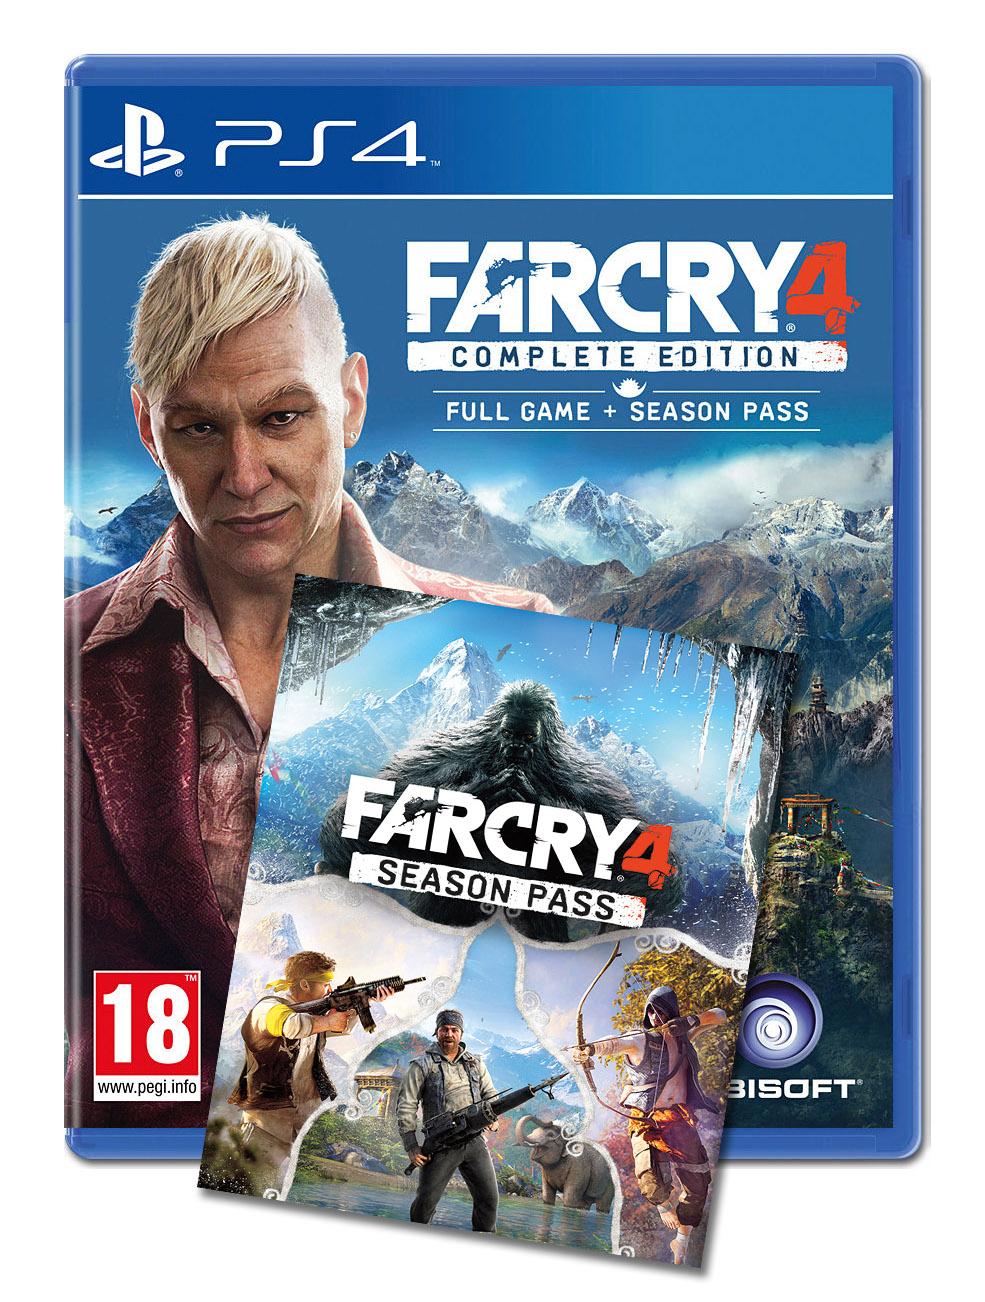 Far Cry 4 Complete Edition ab 18. Juni erhältlich